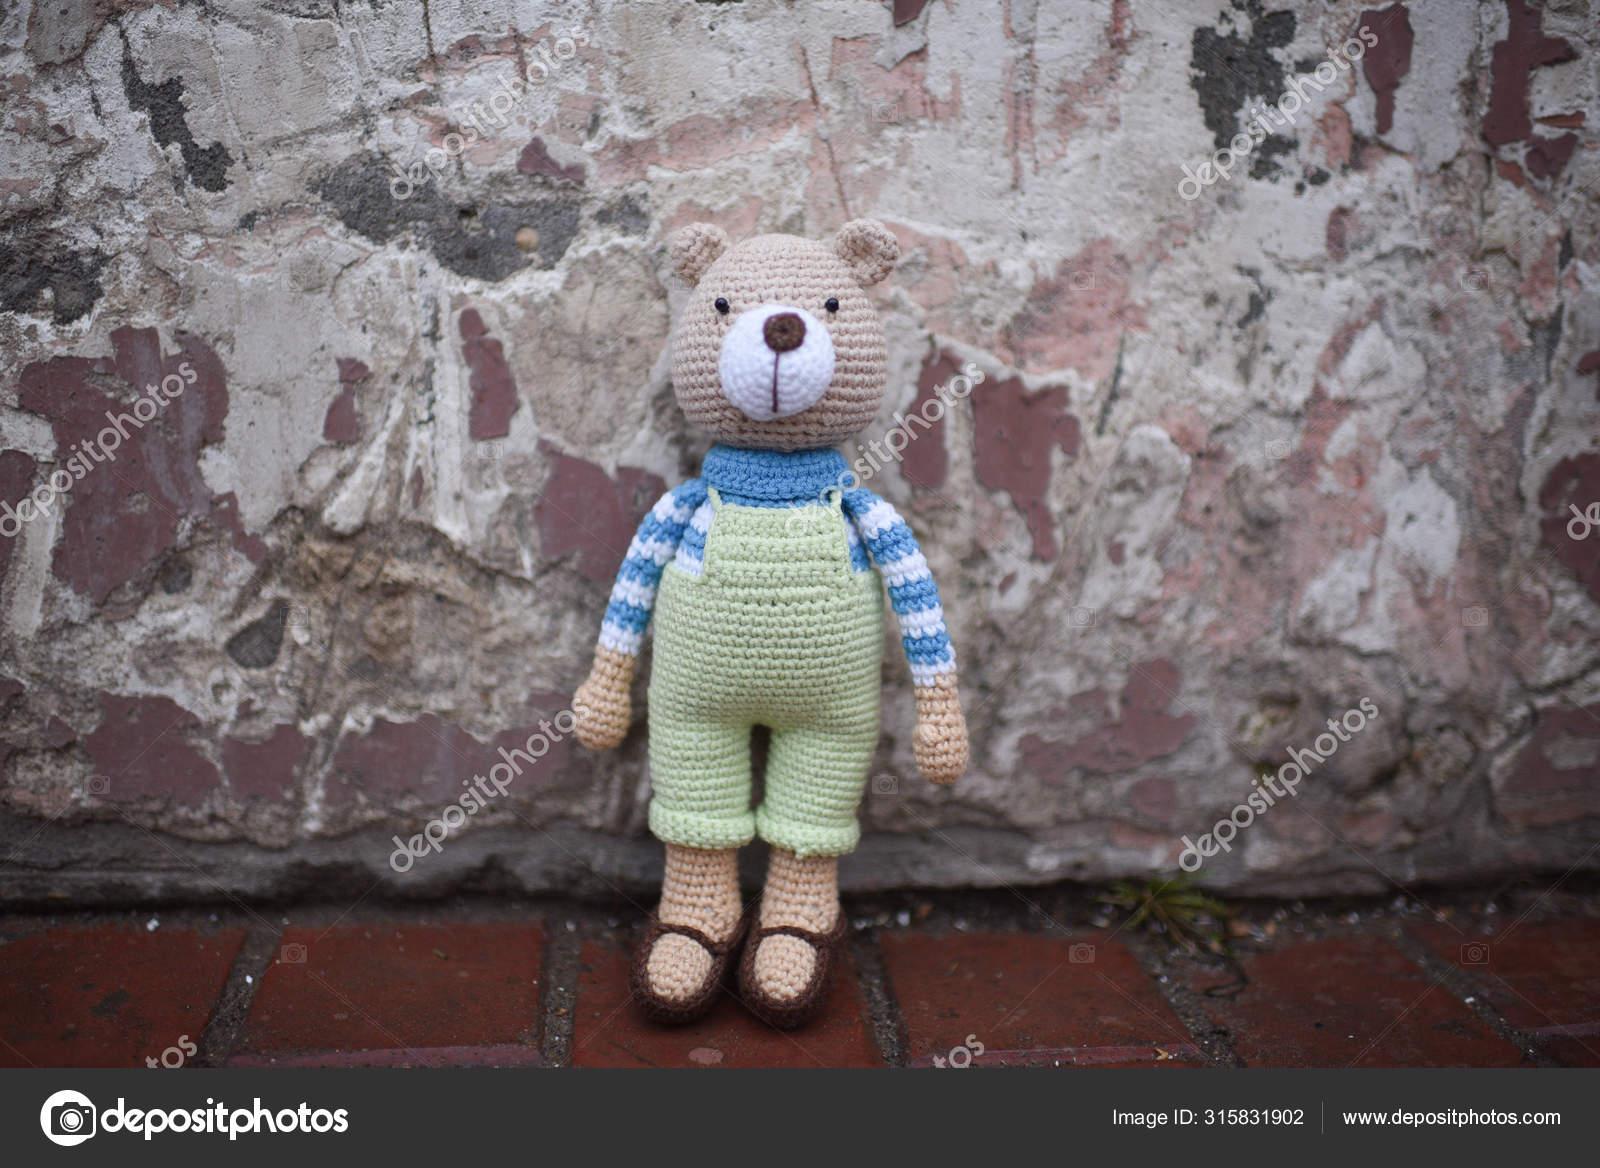 Handmade Amigurumi Teddy Bear On Wooden Table Stock Photo ...   1168x1600